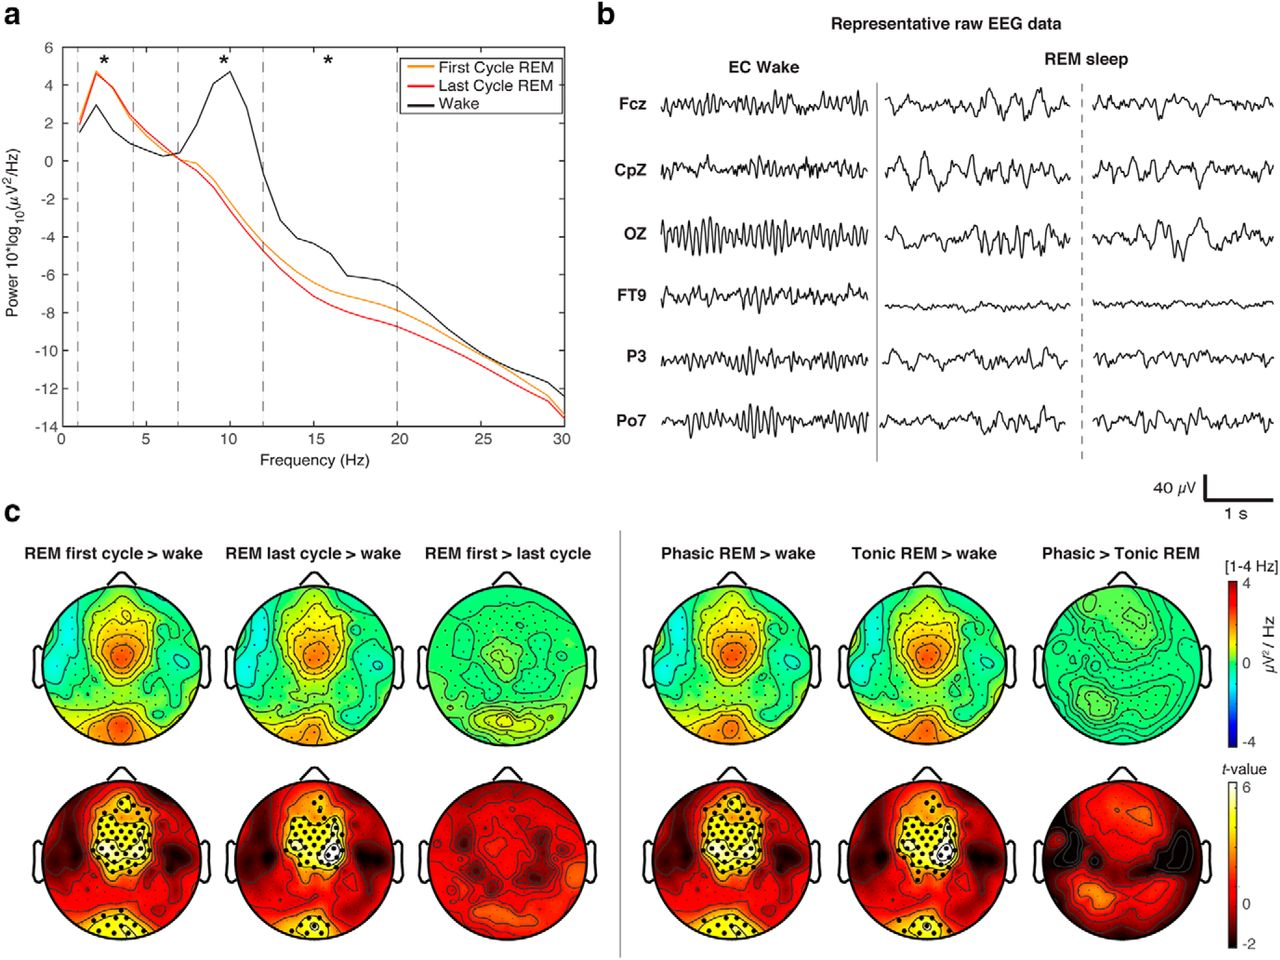 Human Rapid Eye Movement Sleep Shows Local Increases in Low